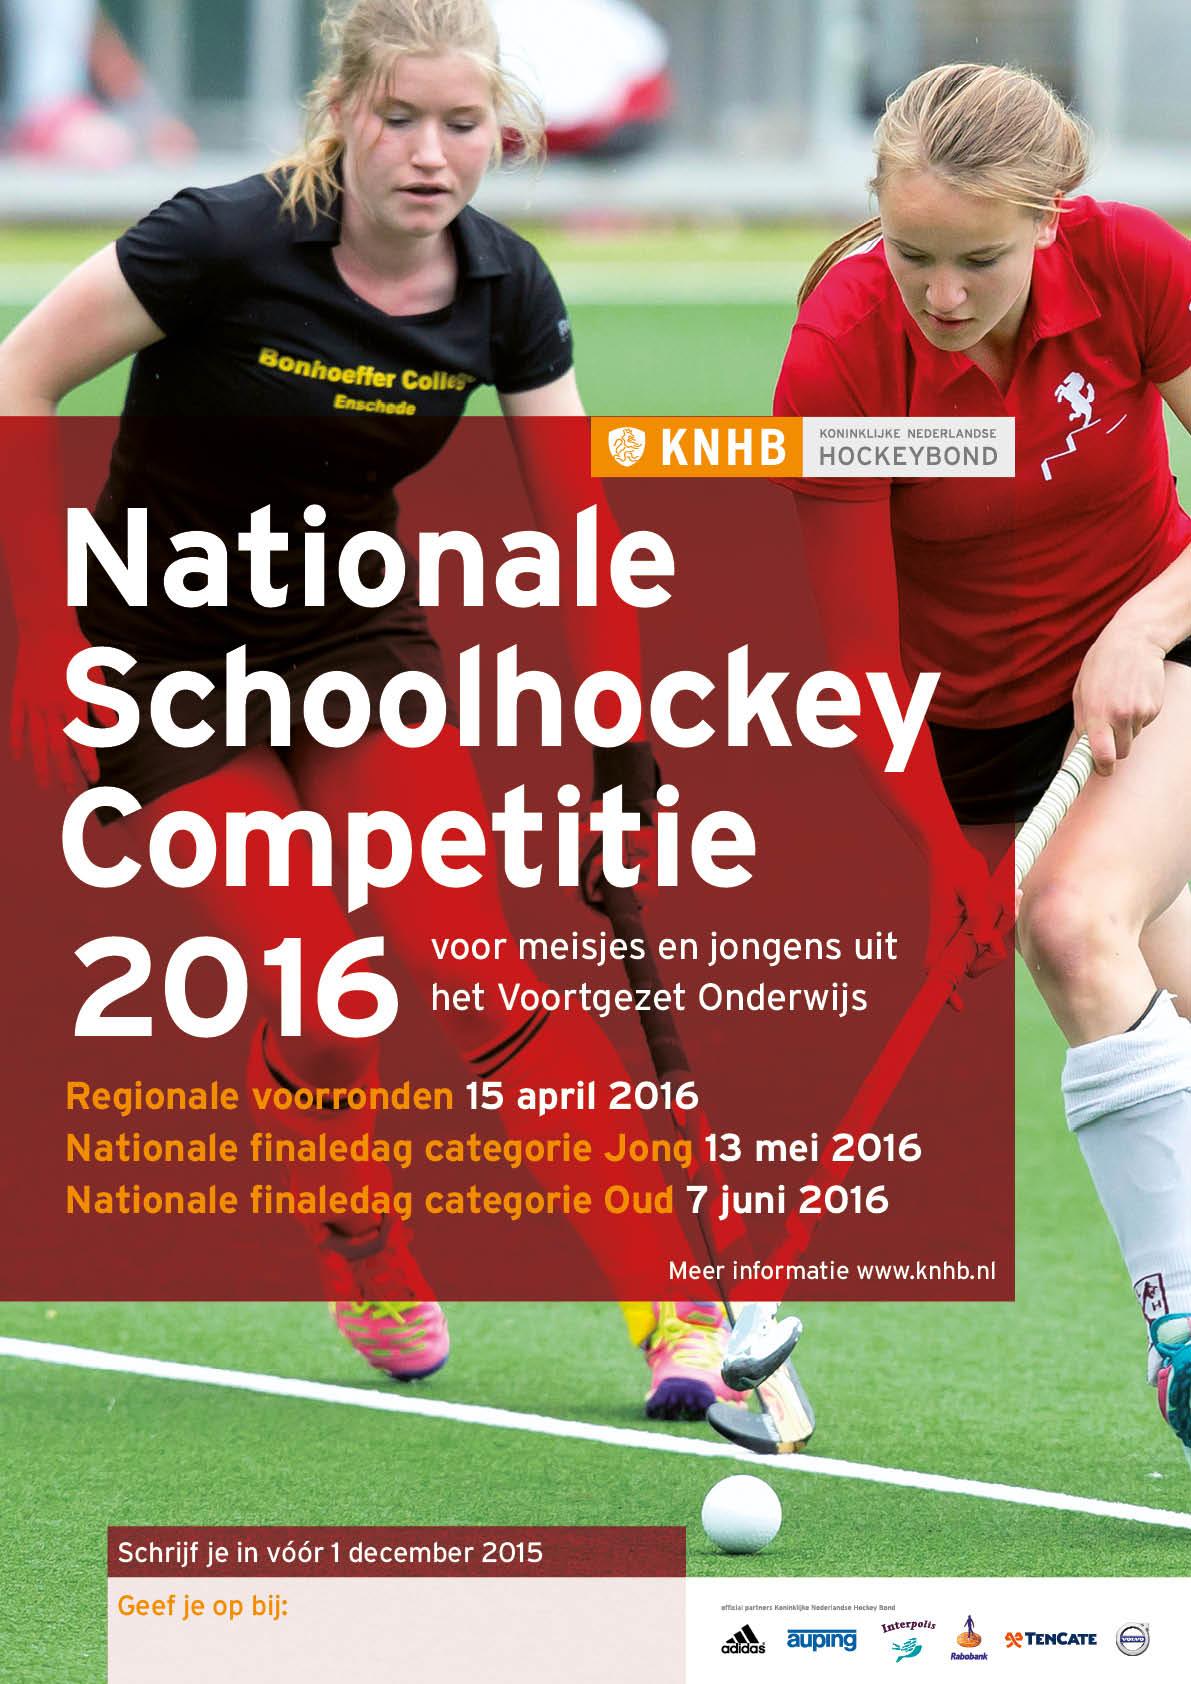 Schoolhockeycompetitie2016